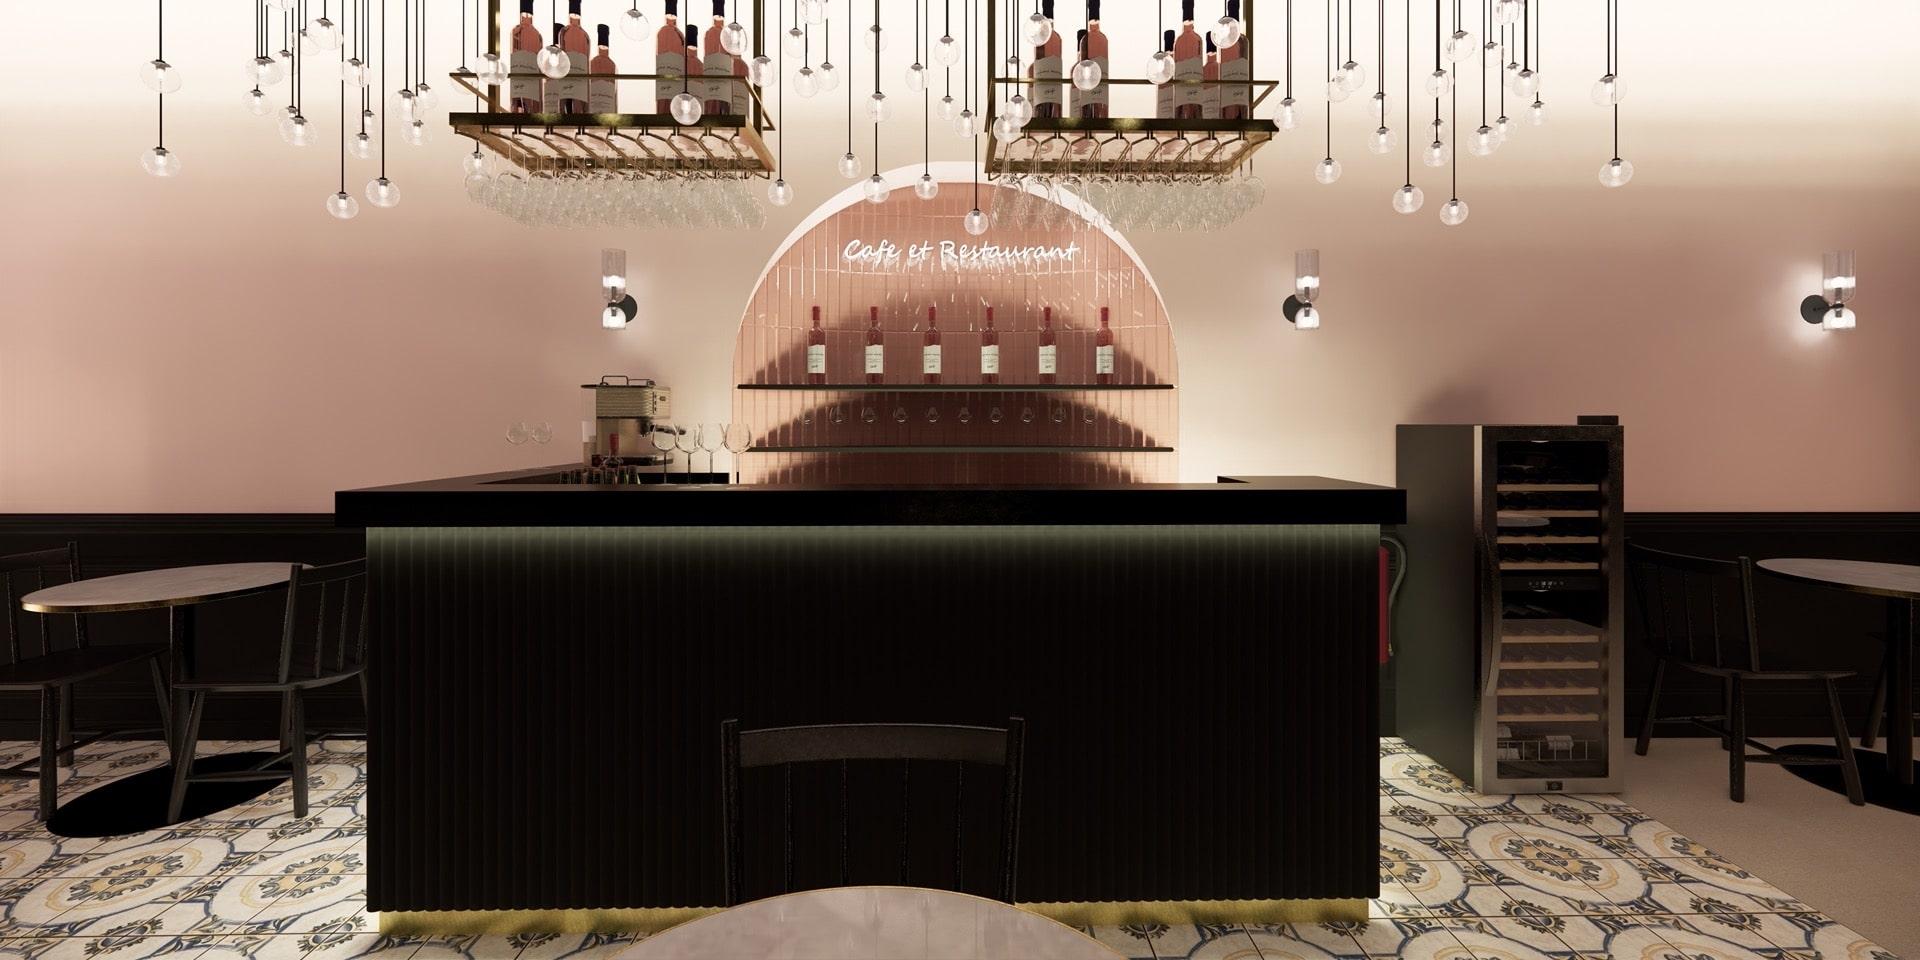 Restaurant design - Atelier Soo